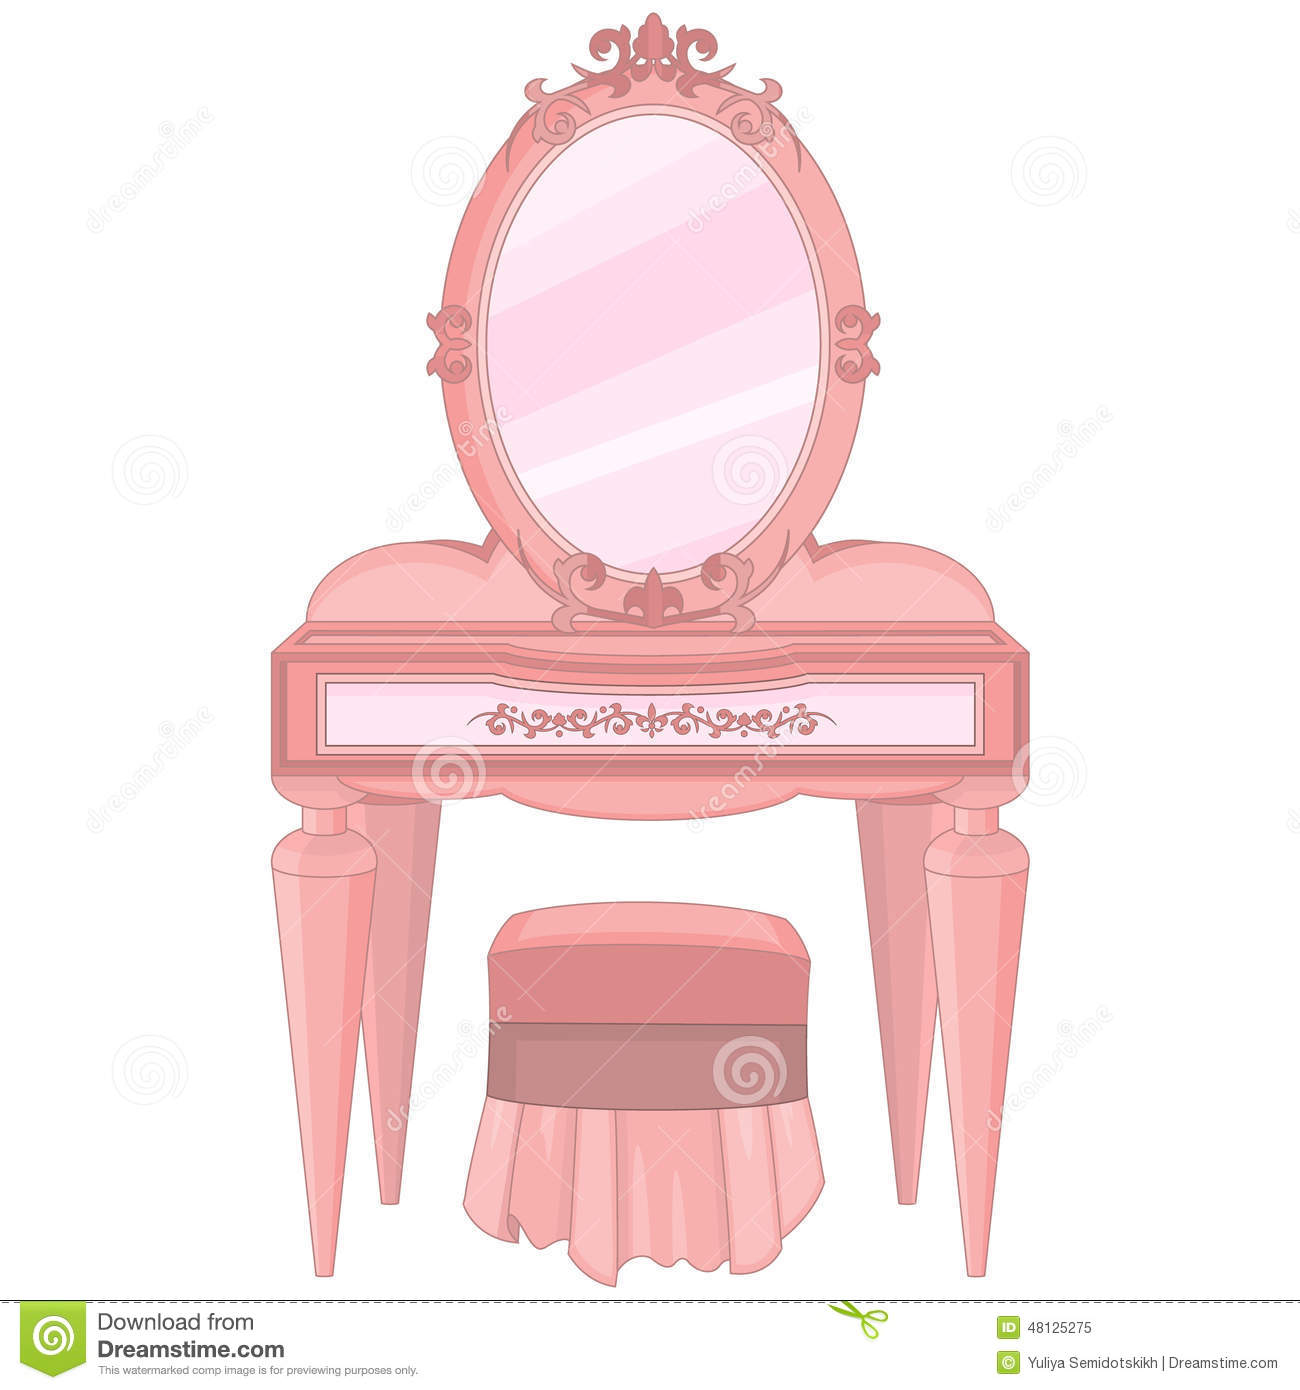 princess mirror clipart - photo #12